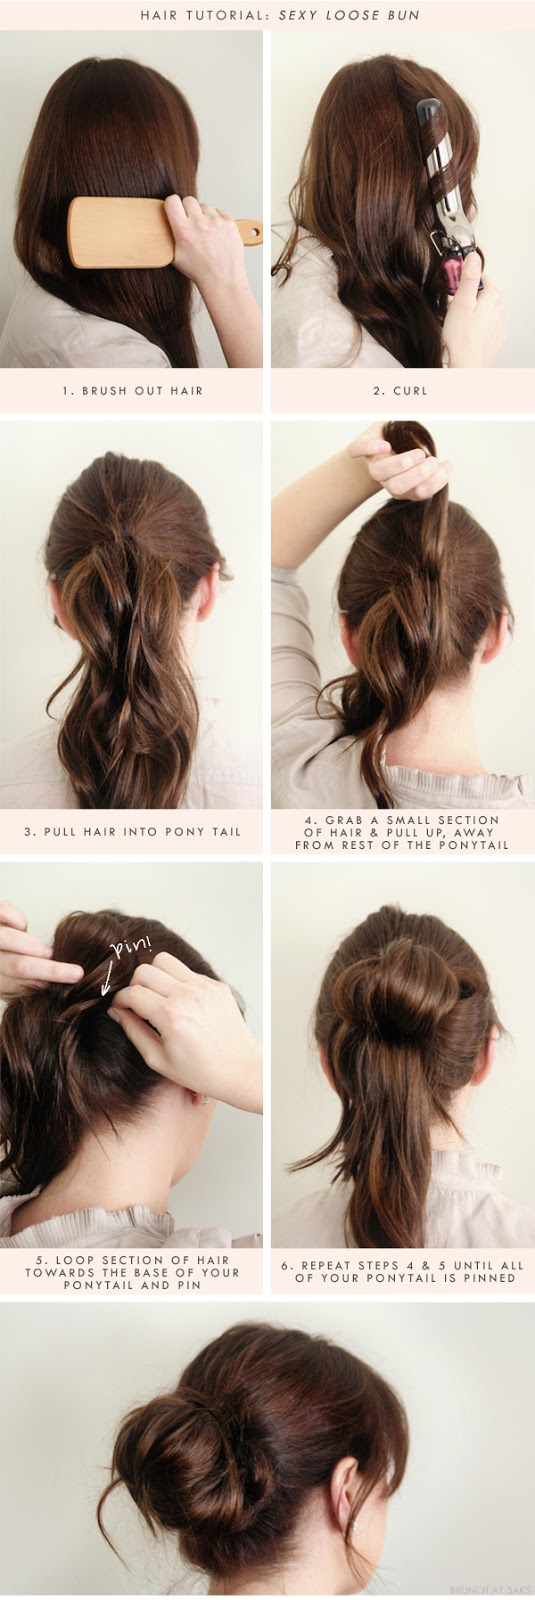 Phenomenal Top 25 Messy Hair Bun Tutorials Perfect For Those Lazy Mornings Short Hairstyles Gunalazisus